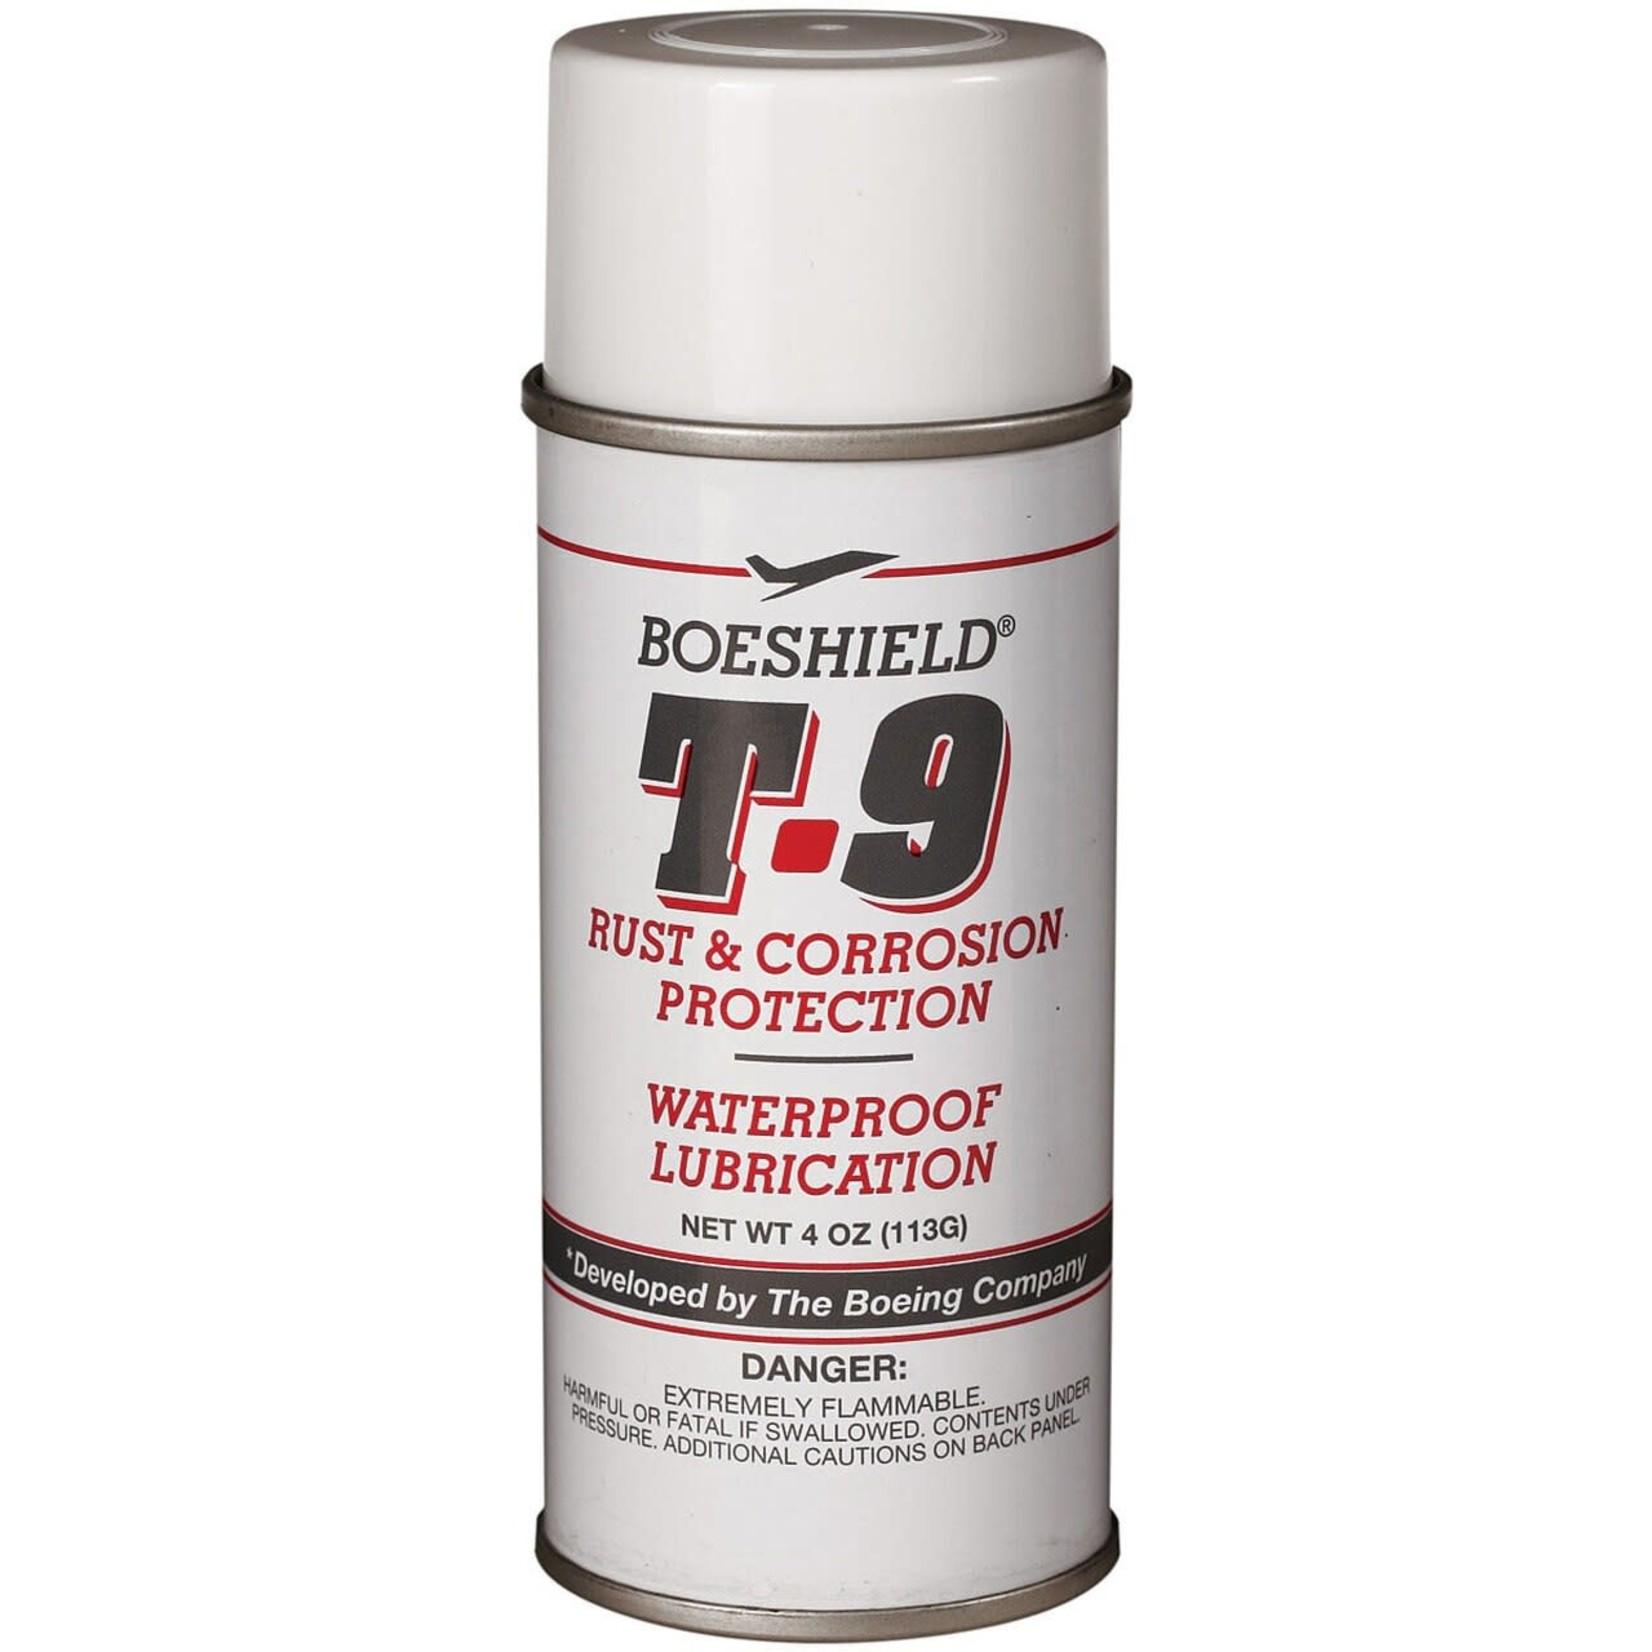 Boeshield Boeshield T9 4oz Aerosol Chain Lube and Rust Inhibitor